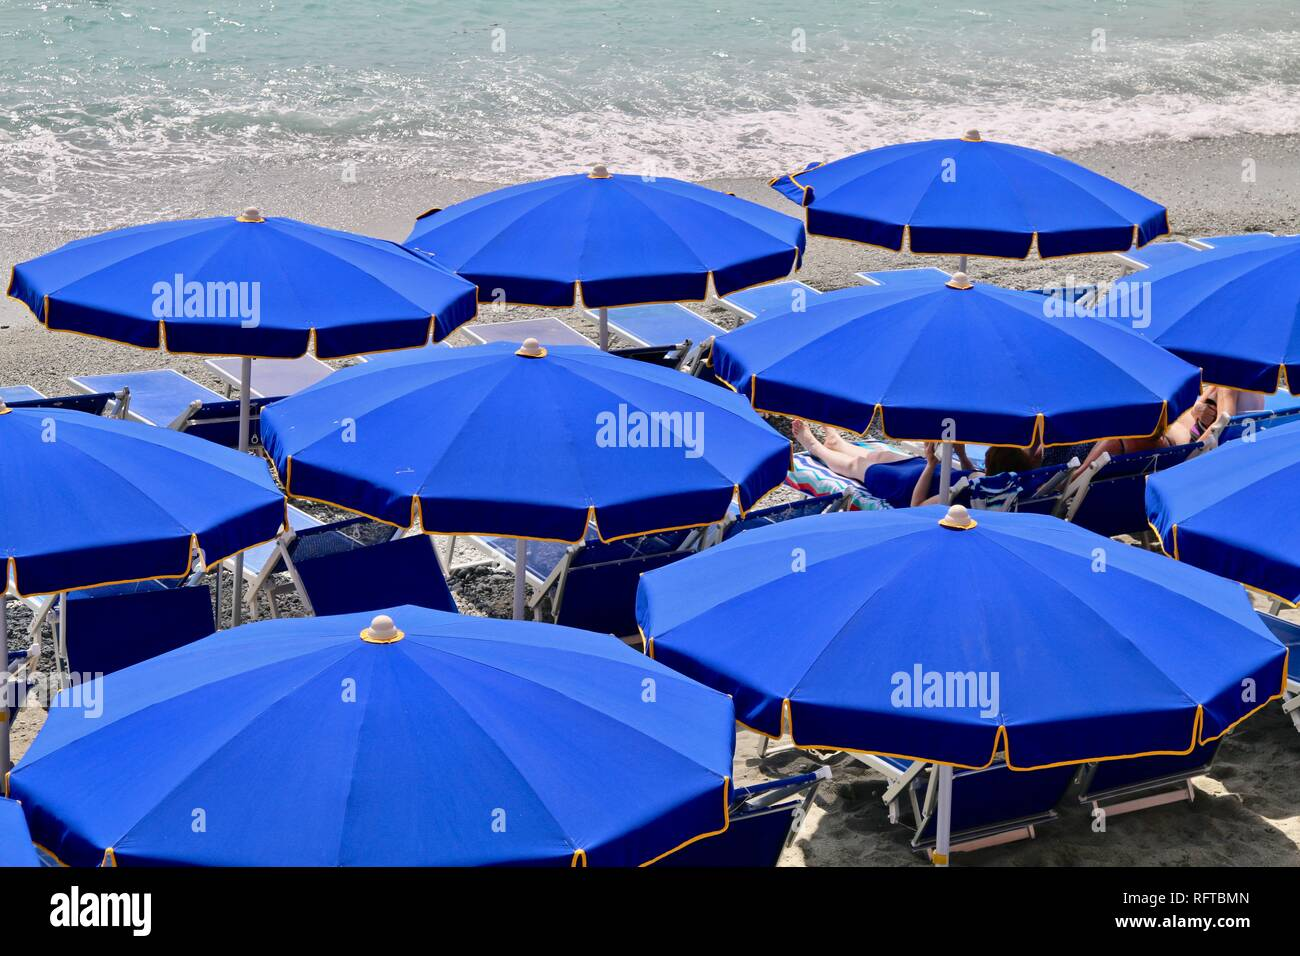 Blue beach umbrellas on an Italian beach overlooking the Mediterranean - Stock Image